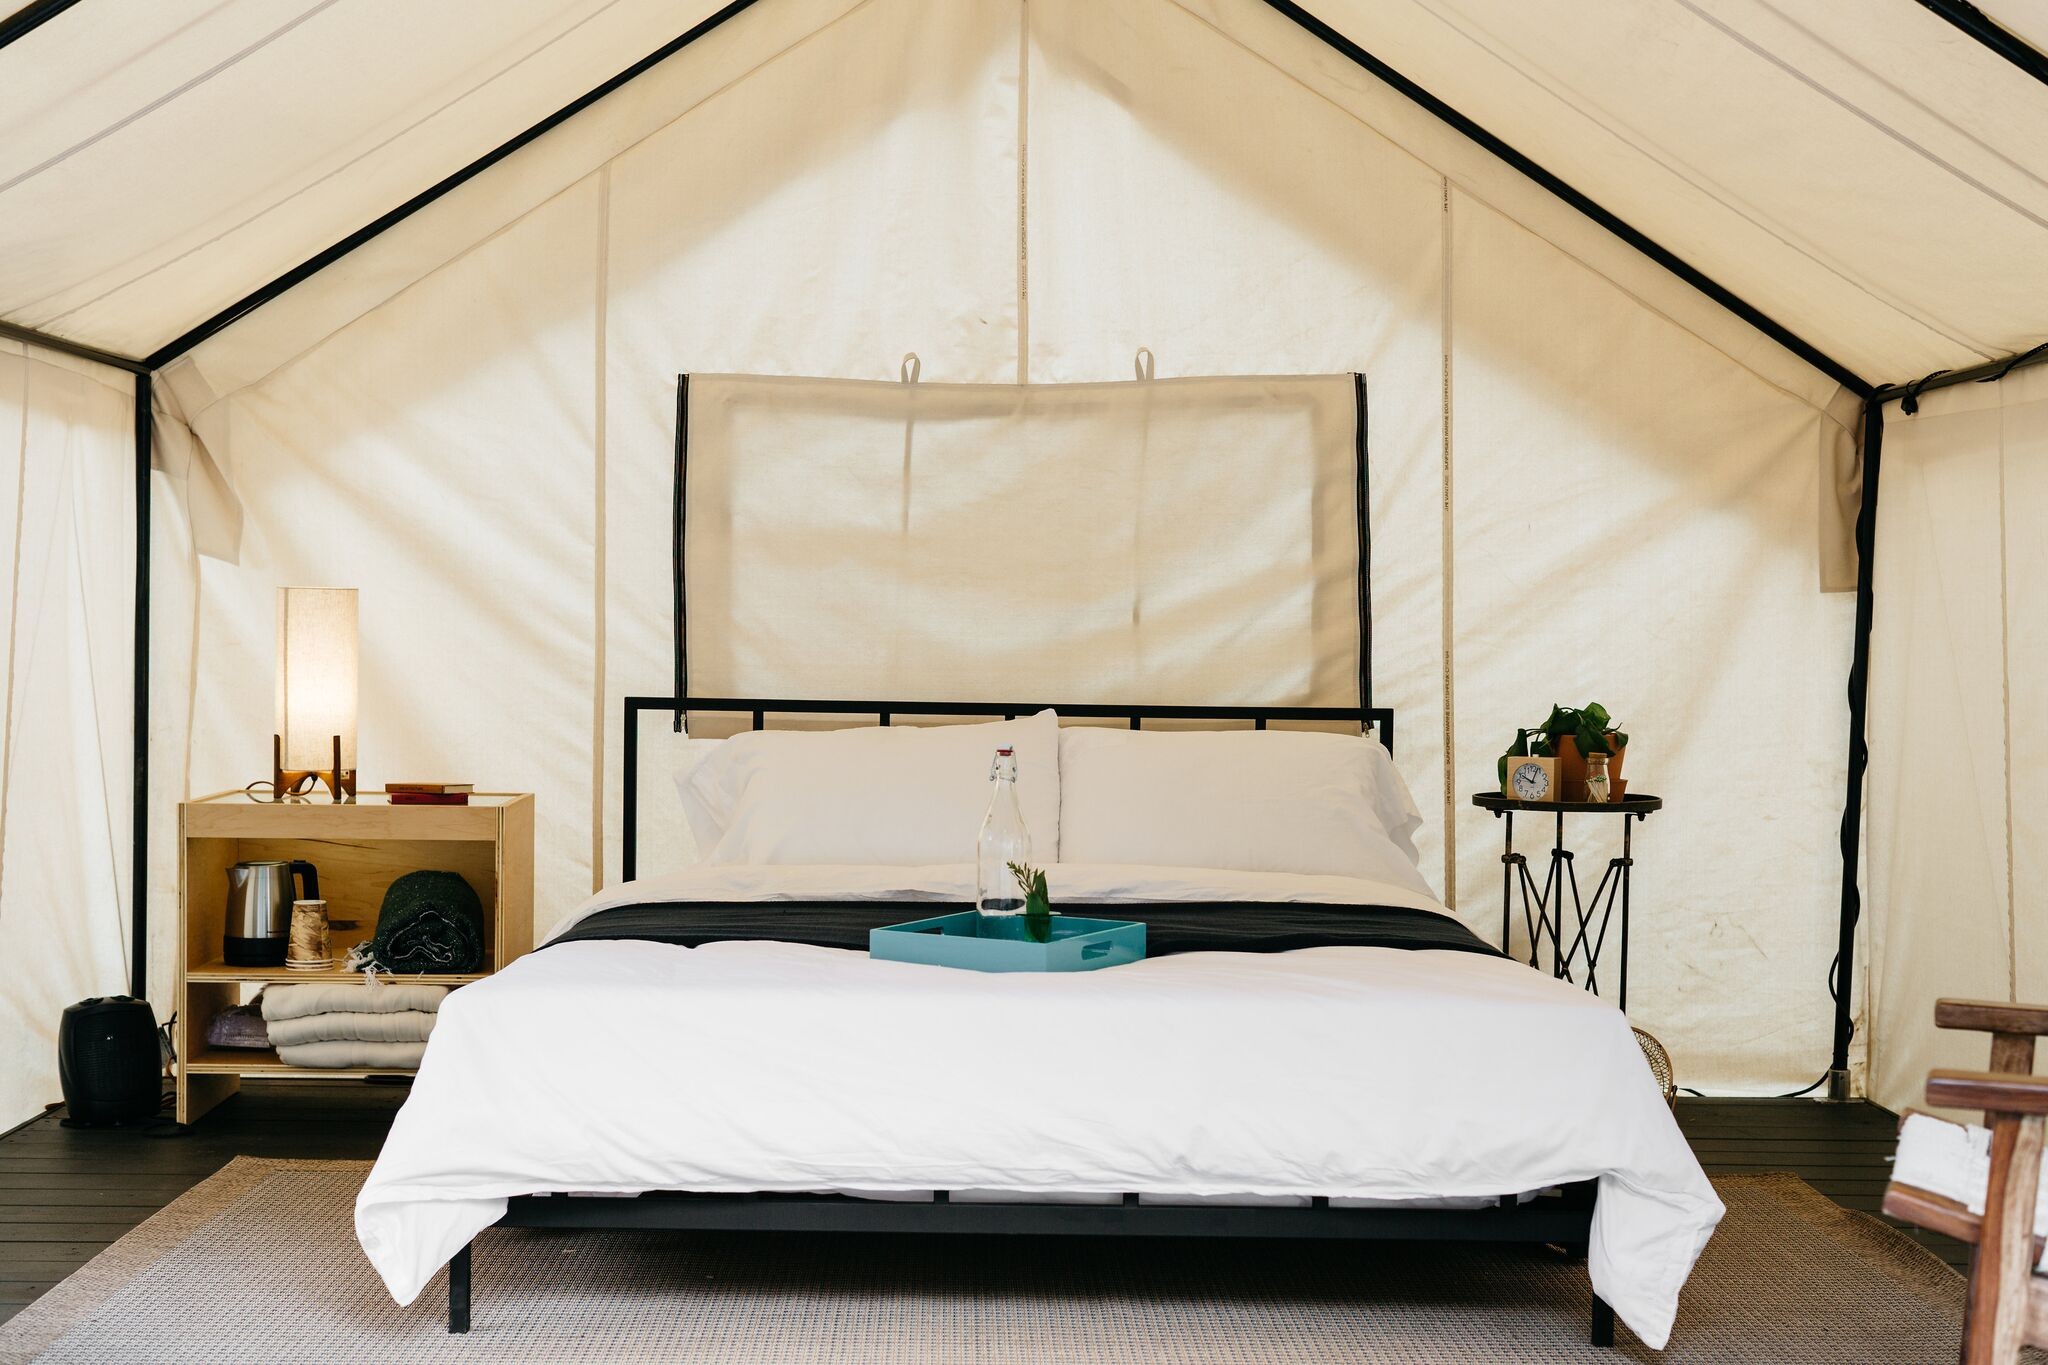 Inside of luxury canvas tent. Photo Melanie Riccardi